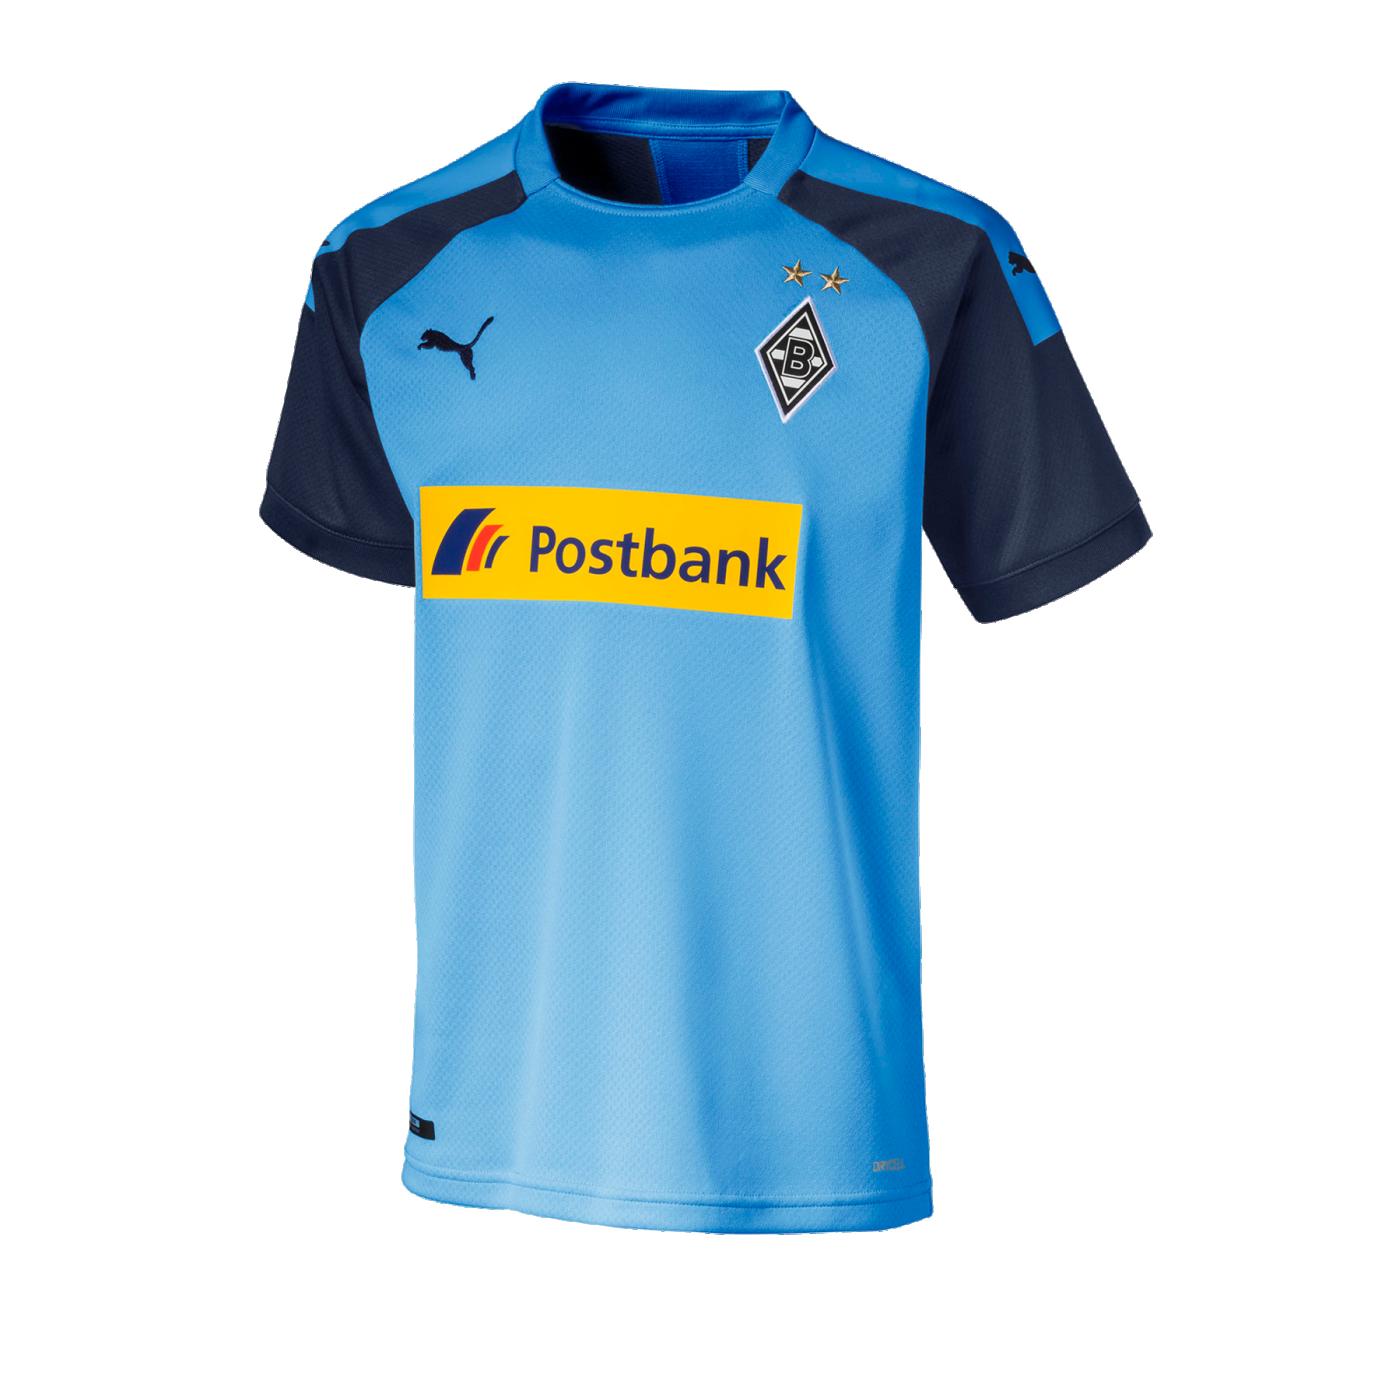 Kicker Borussia Mönchengladbach